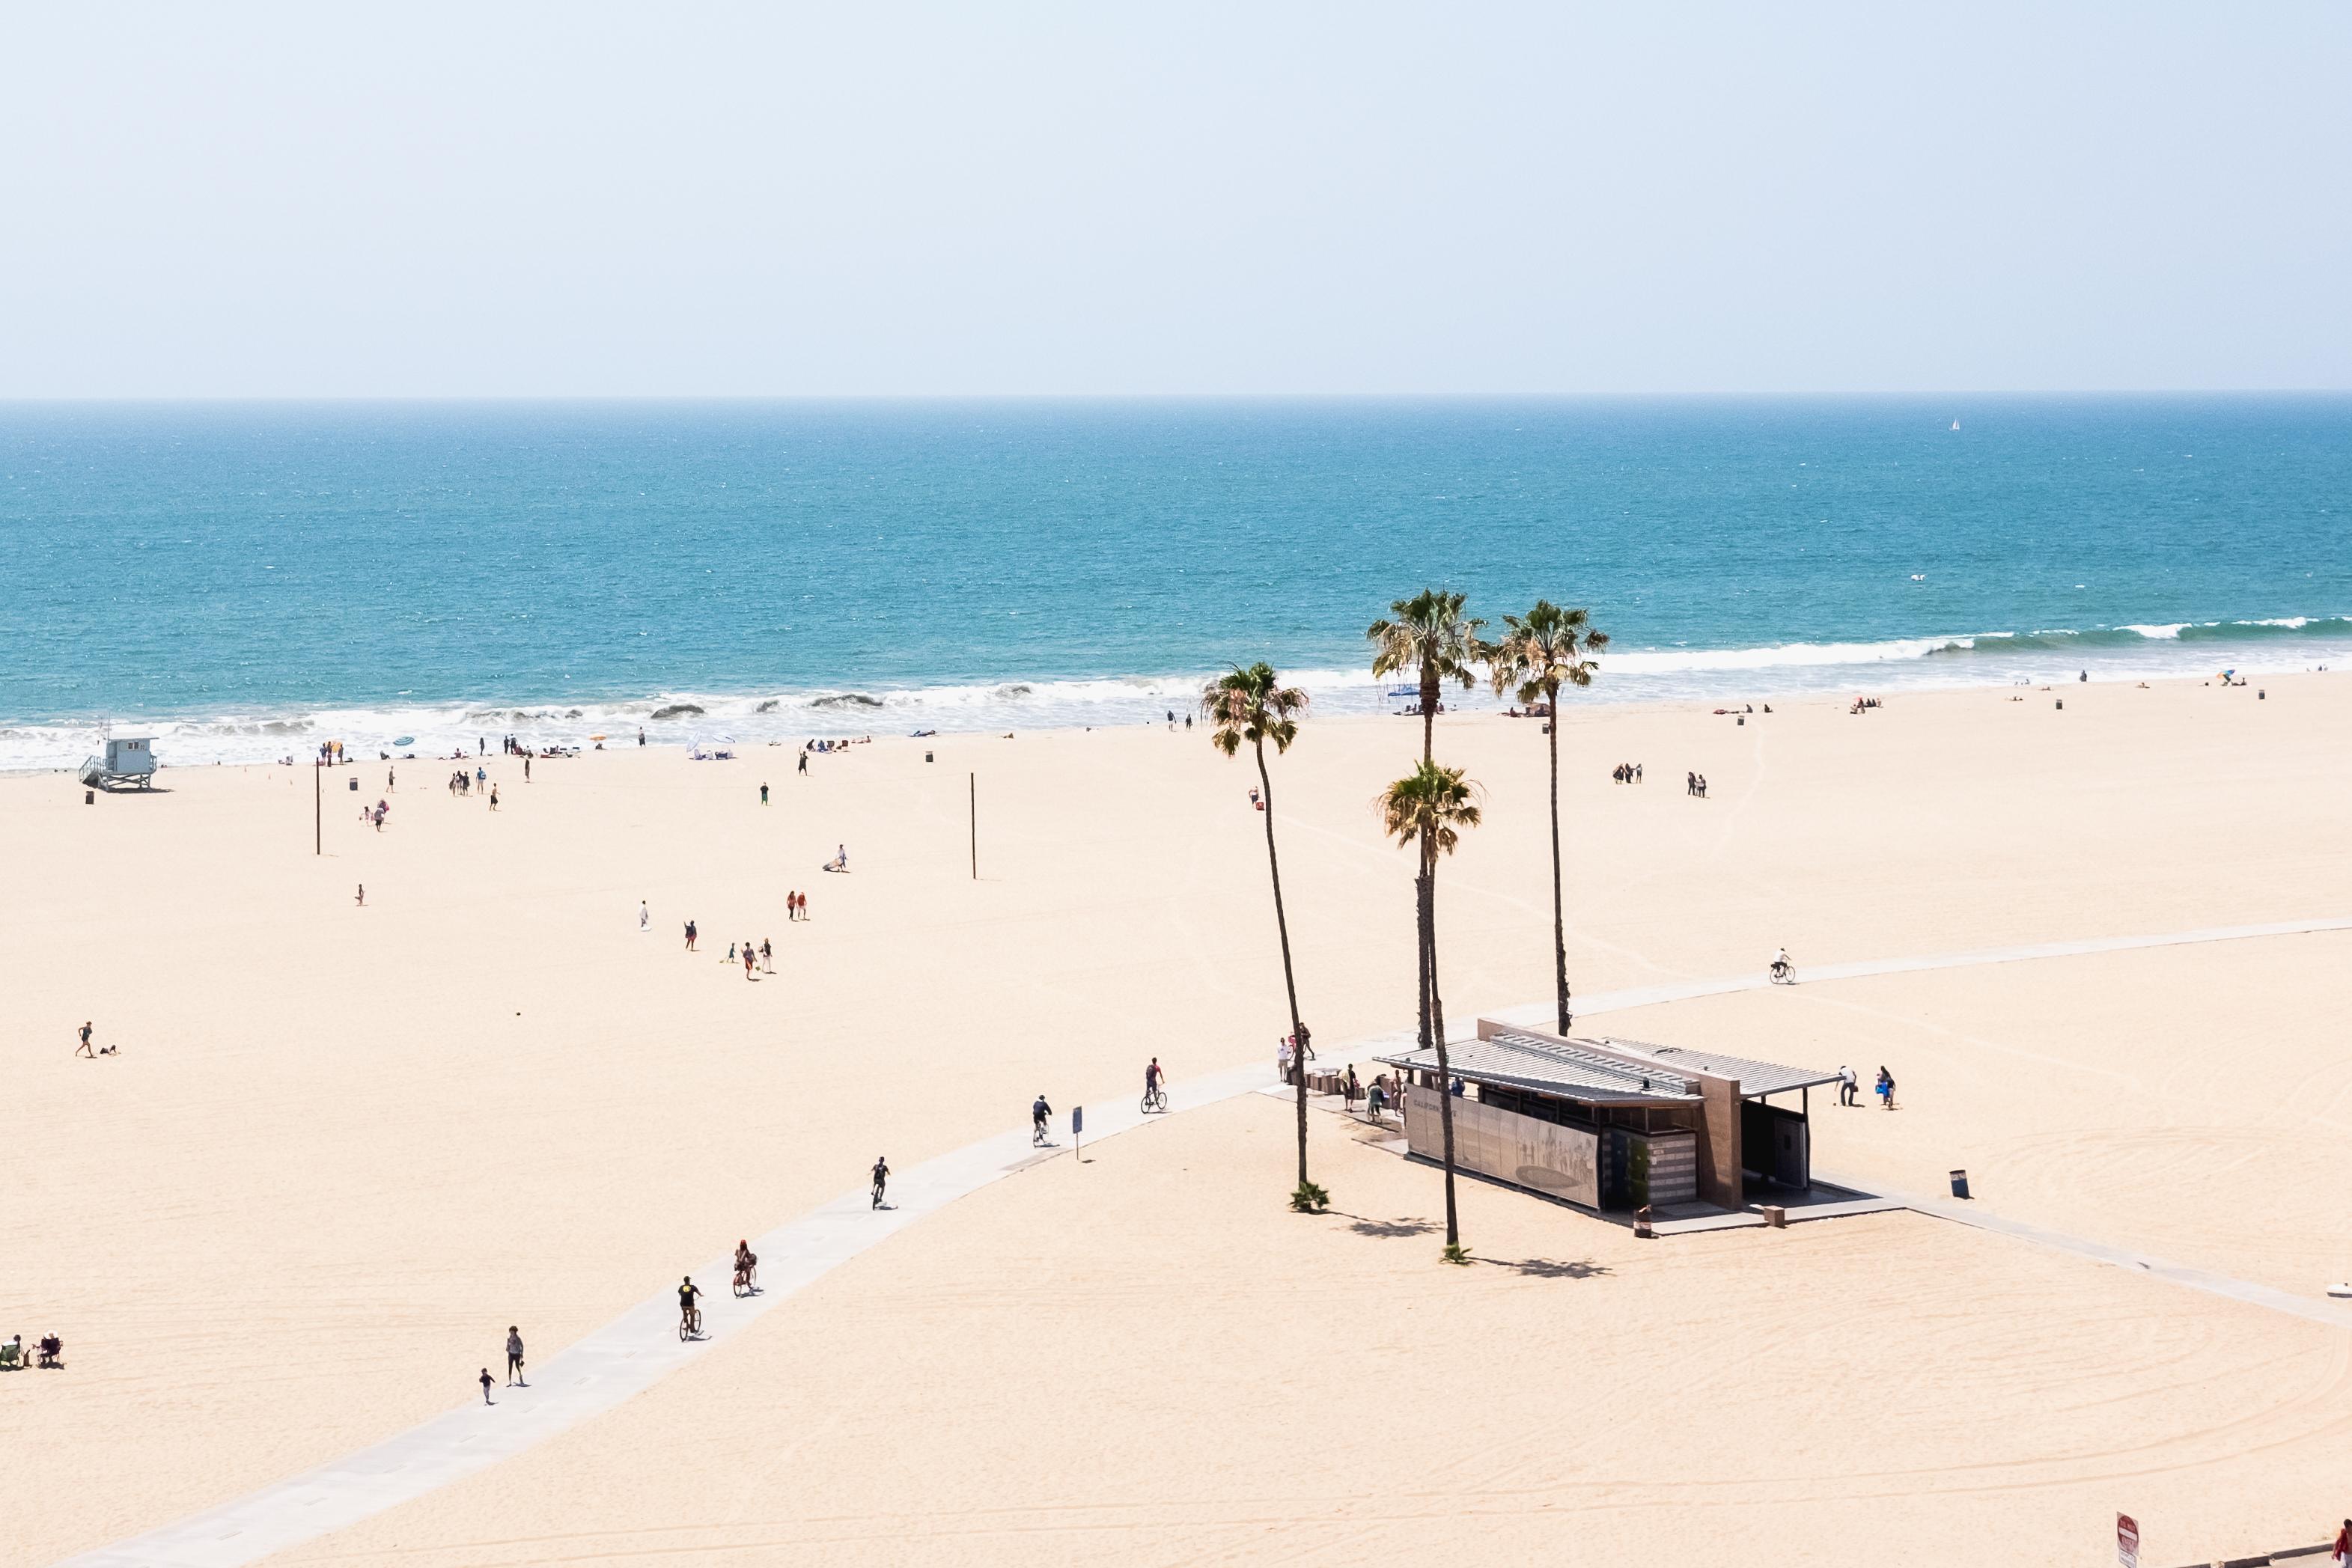 LA's 13 best beaches, mapped